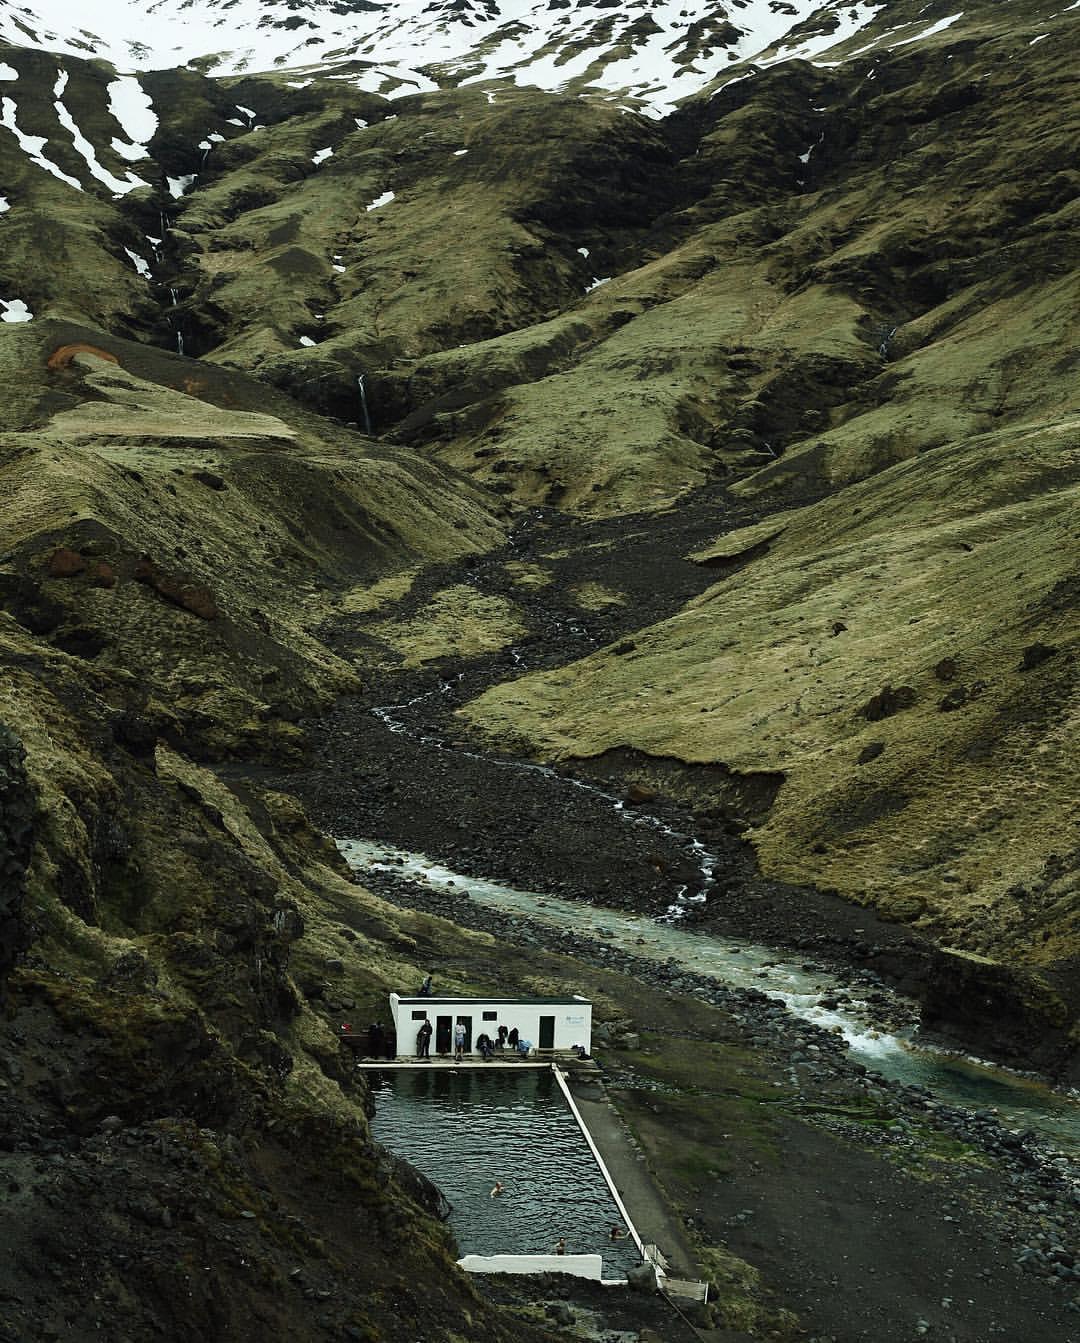 Seljavallalaug:冰島的山谷裡藏了一個絕美的秘密游泳池 4